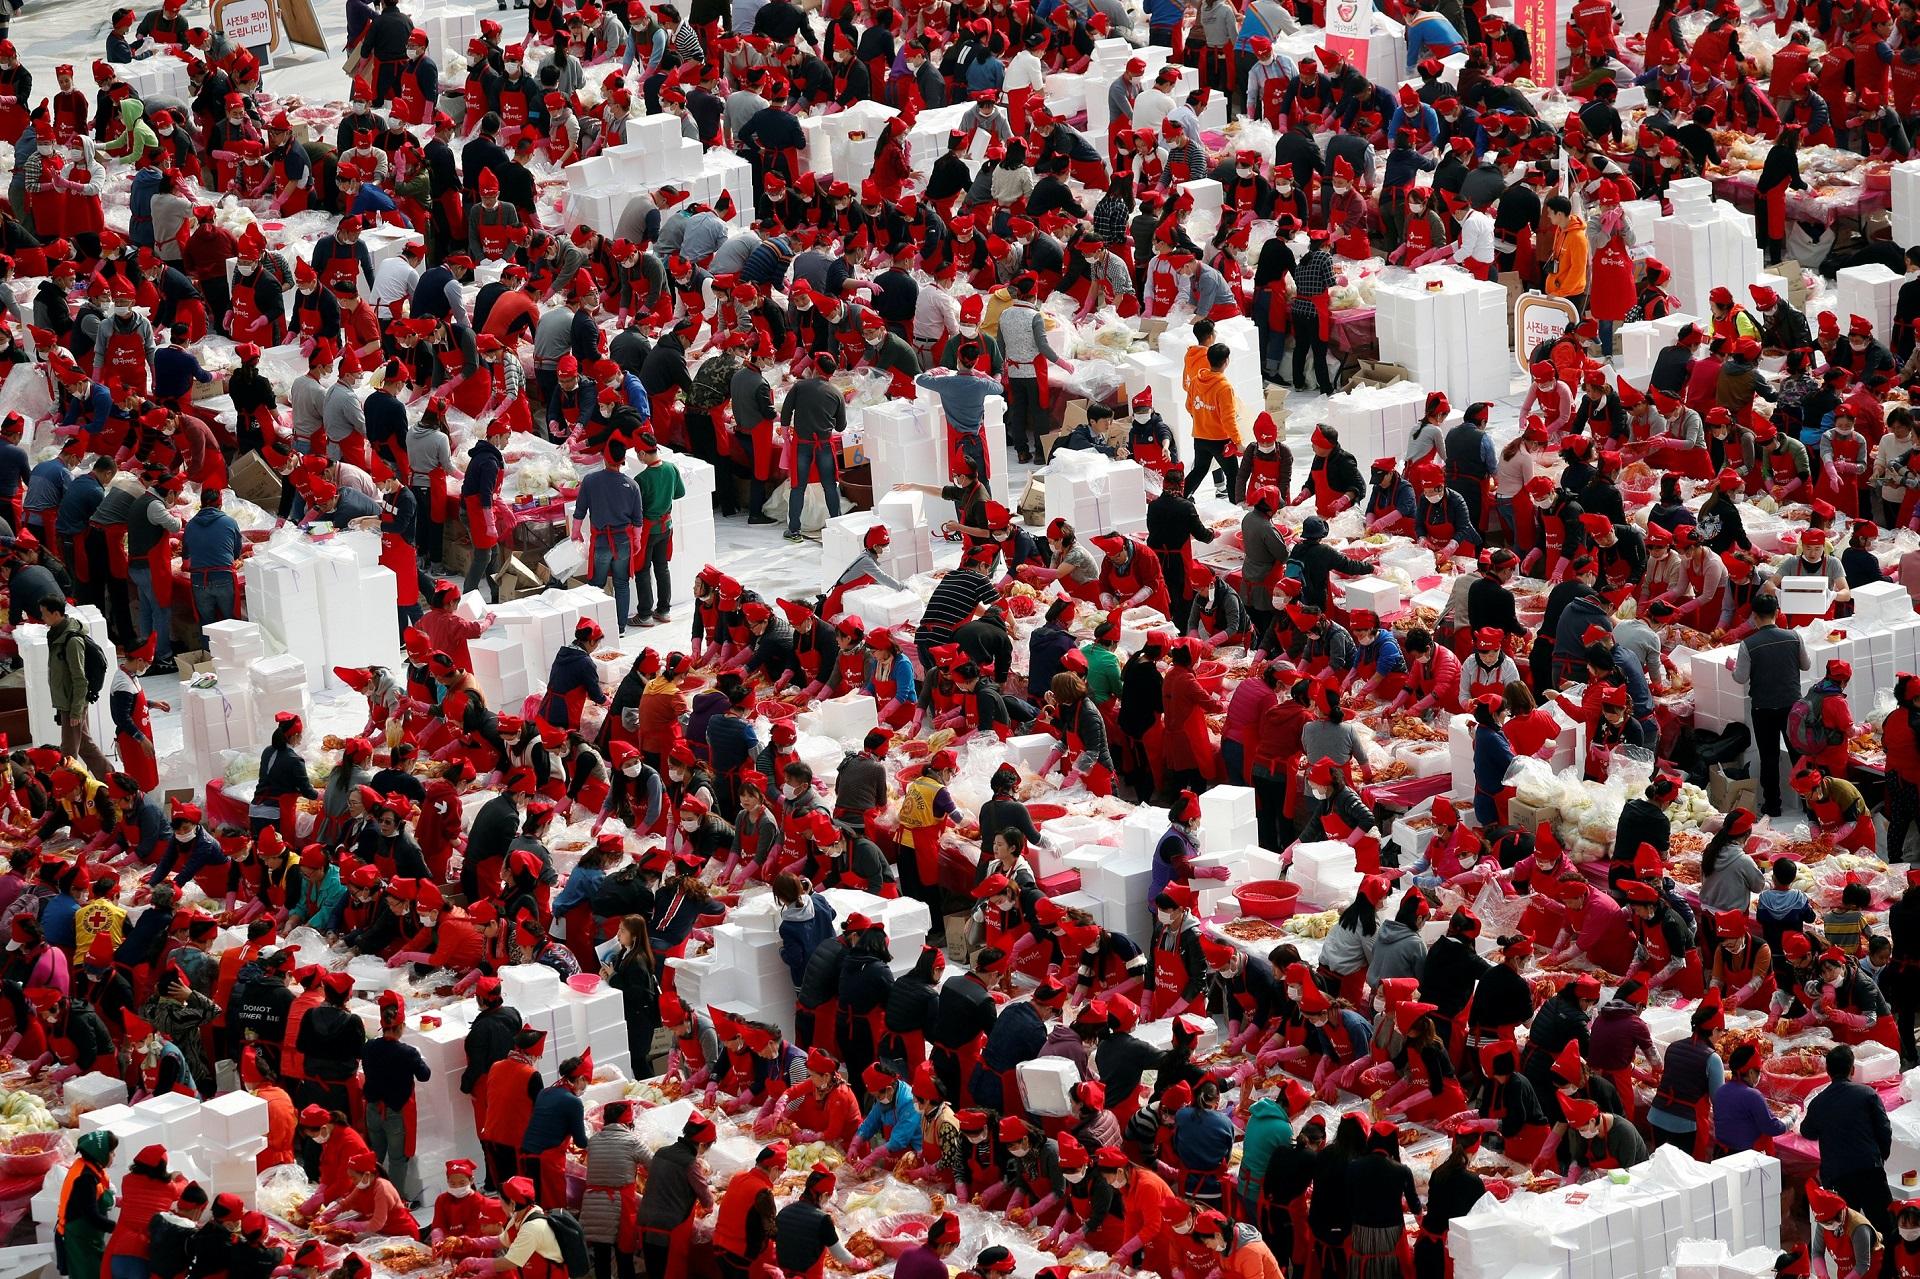 People take part in the Seoul Kimchi Festival in central Seoul, South Korea November 3, 2017.  REUTERS/Kim Hong-Ji